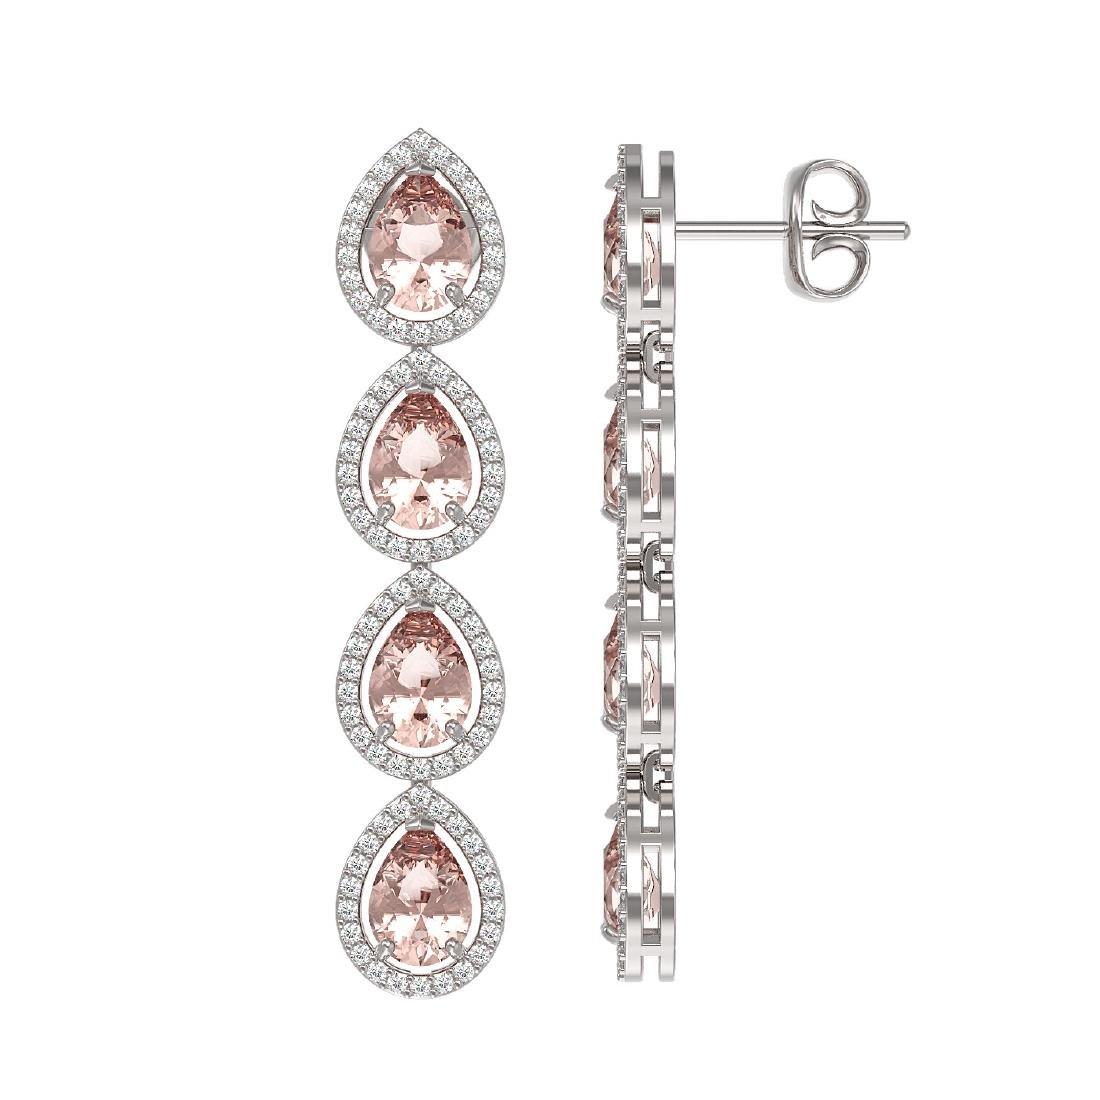 7.8 CTW Morganite & Diamond Halo Earrings 10K White - 2